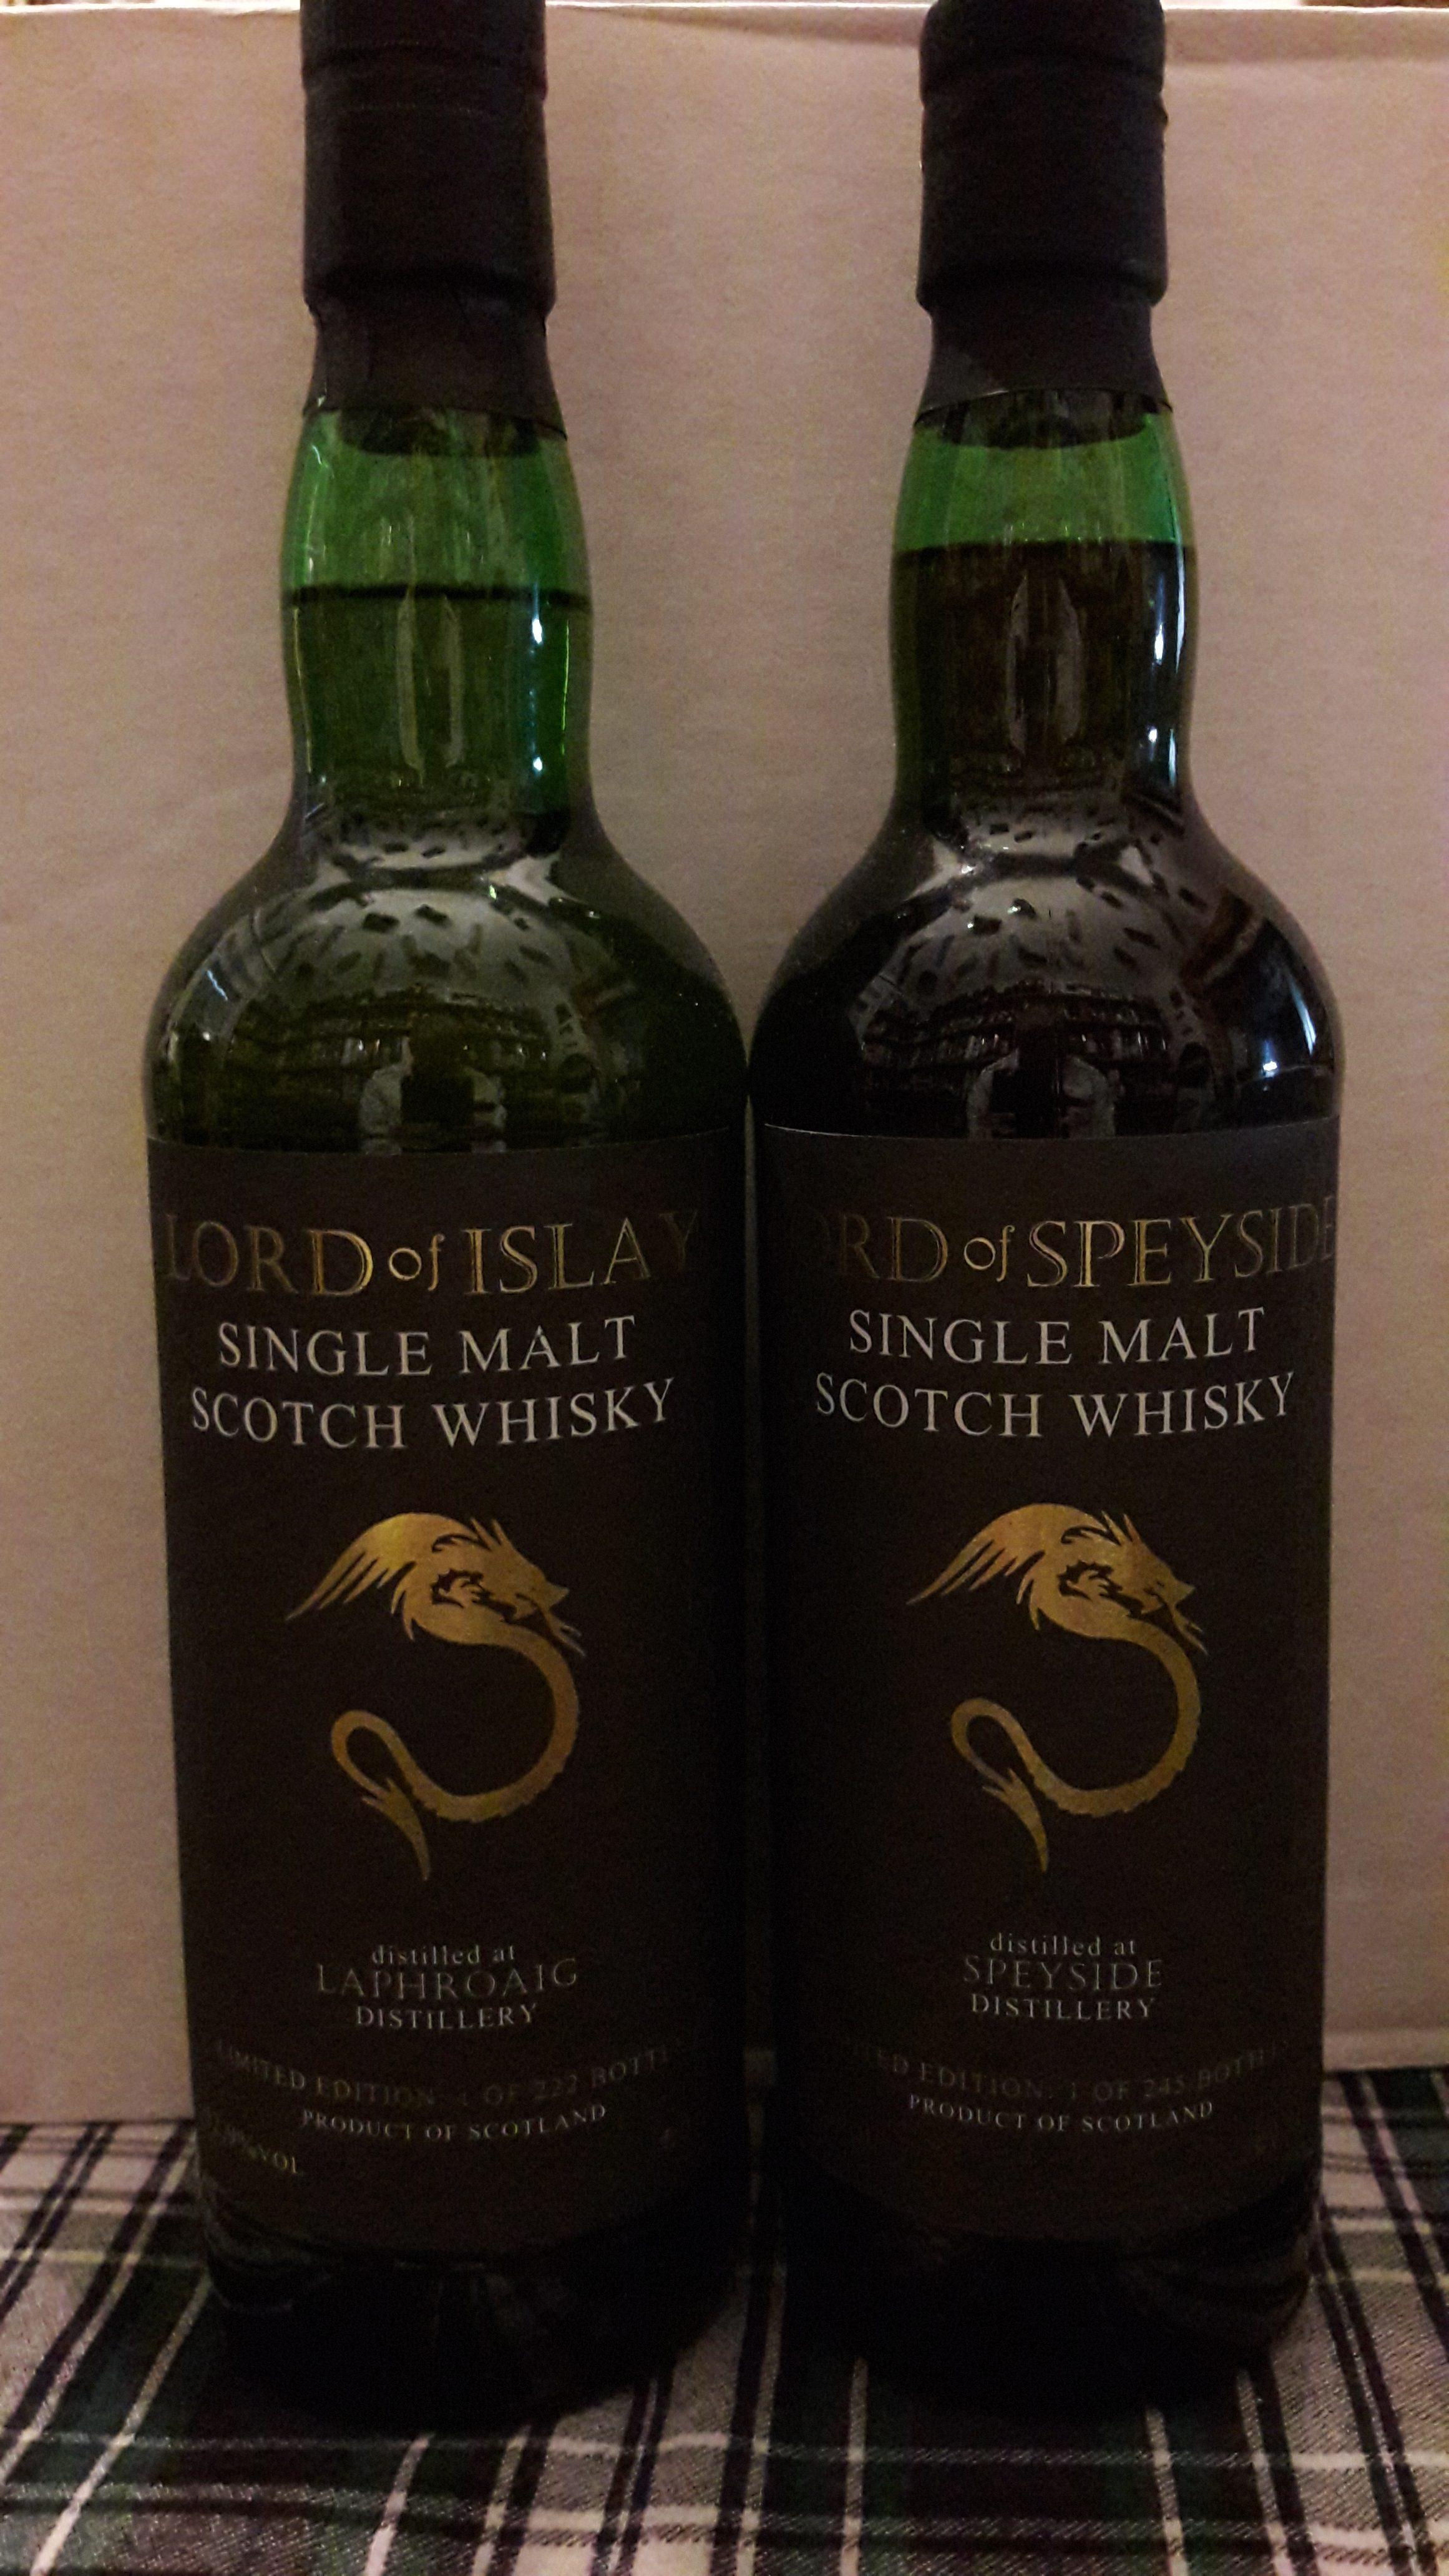 LORD of SPEYSIDE, ein dark sherry Speysider als 2. Abfüllung der Lord-Reihe